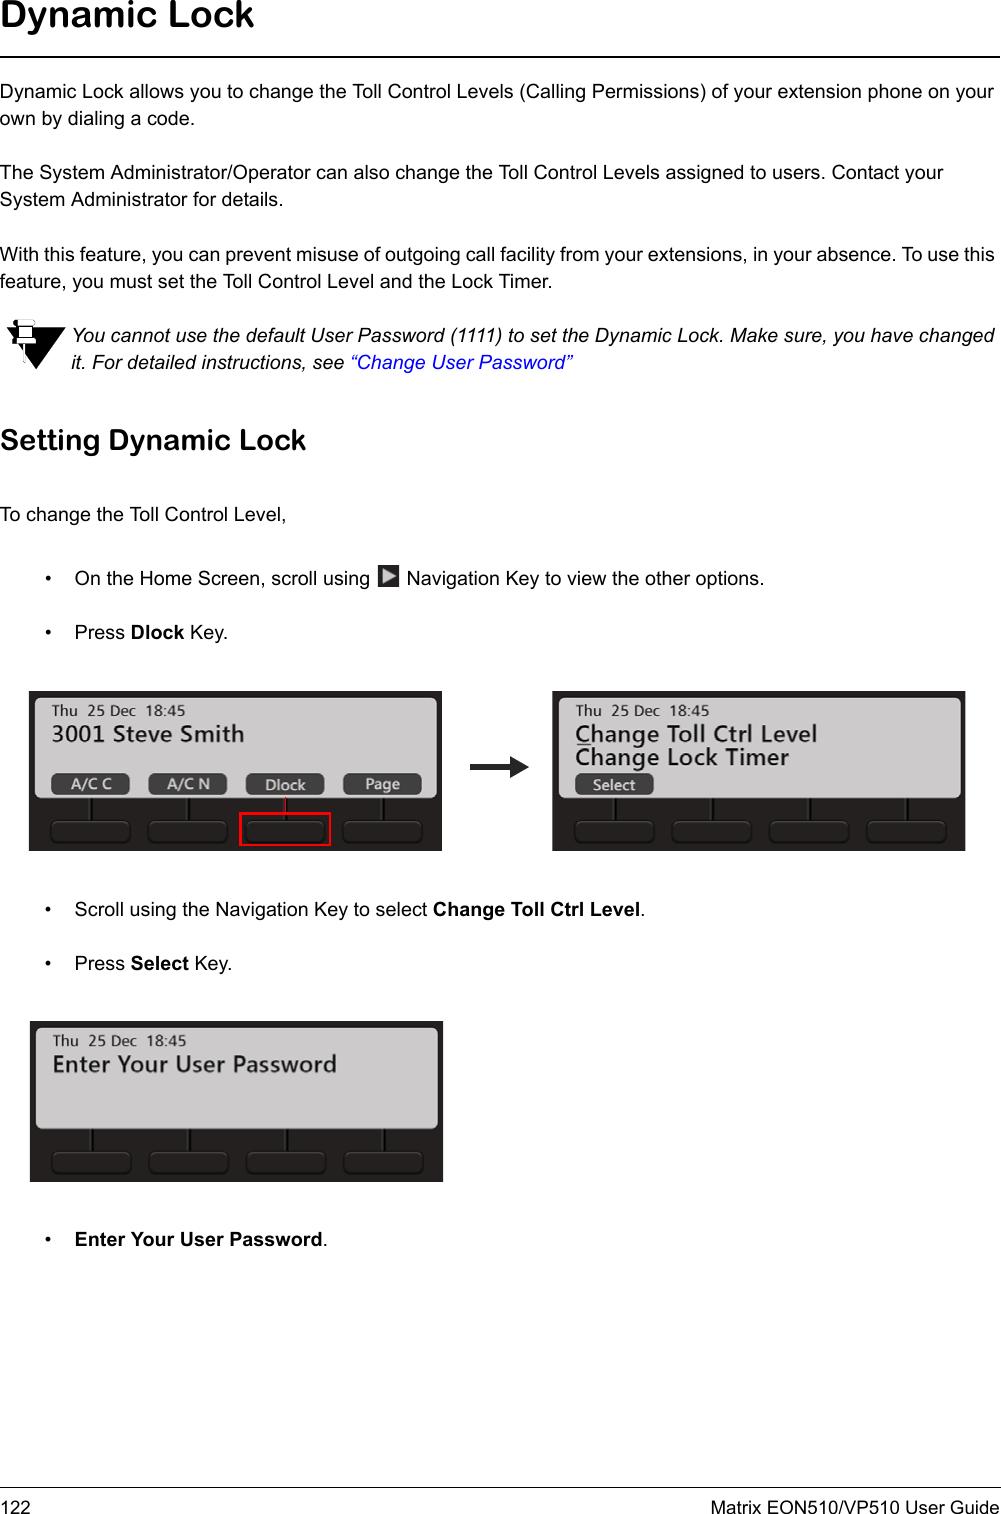 MATRIX COMSEC PVT VP510 SPARSH VP510 User Manual EON510 User